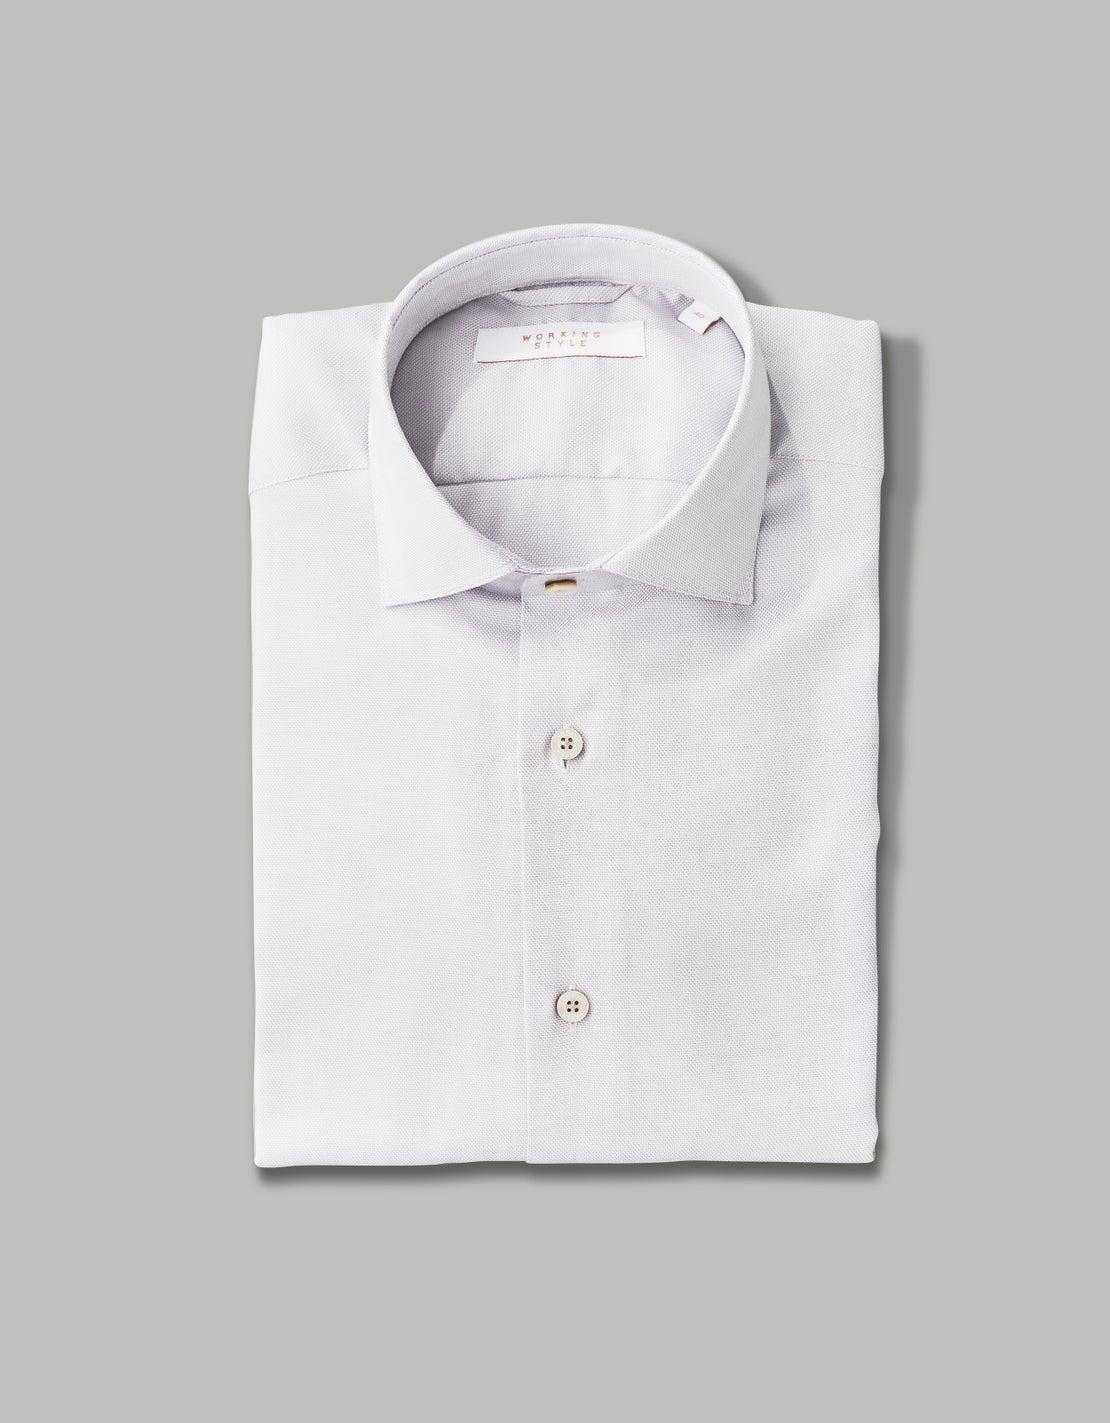 Pewter Step Weave Shirt